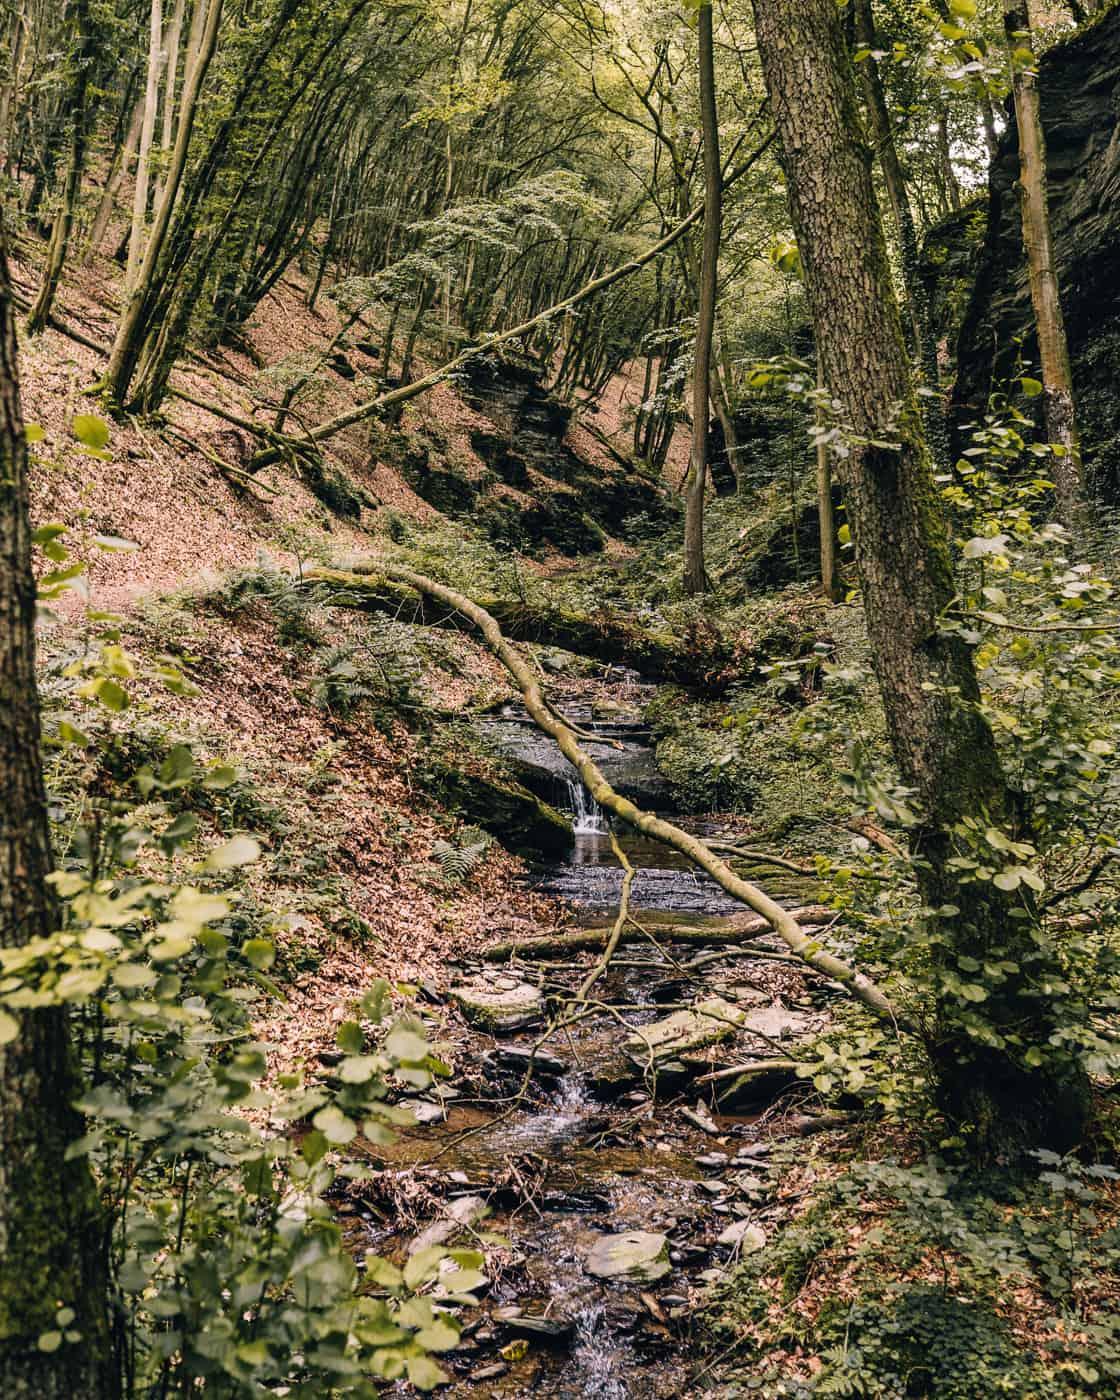 Baybachklamm Traumschleife Wanderung - Entlang des Frankenweiler Bachs